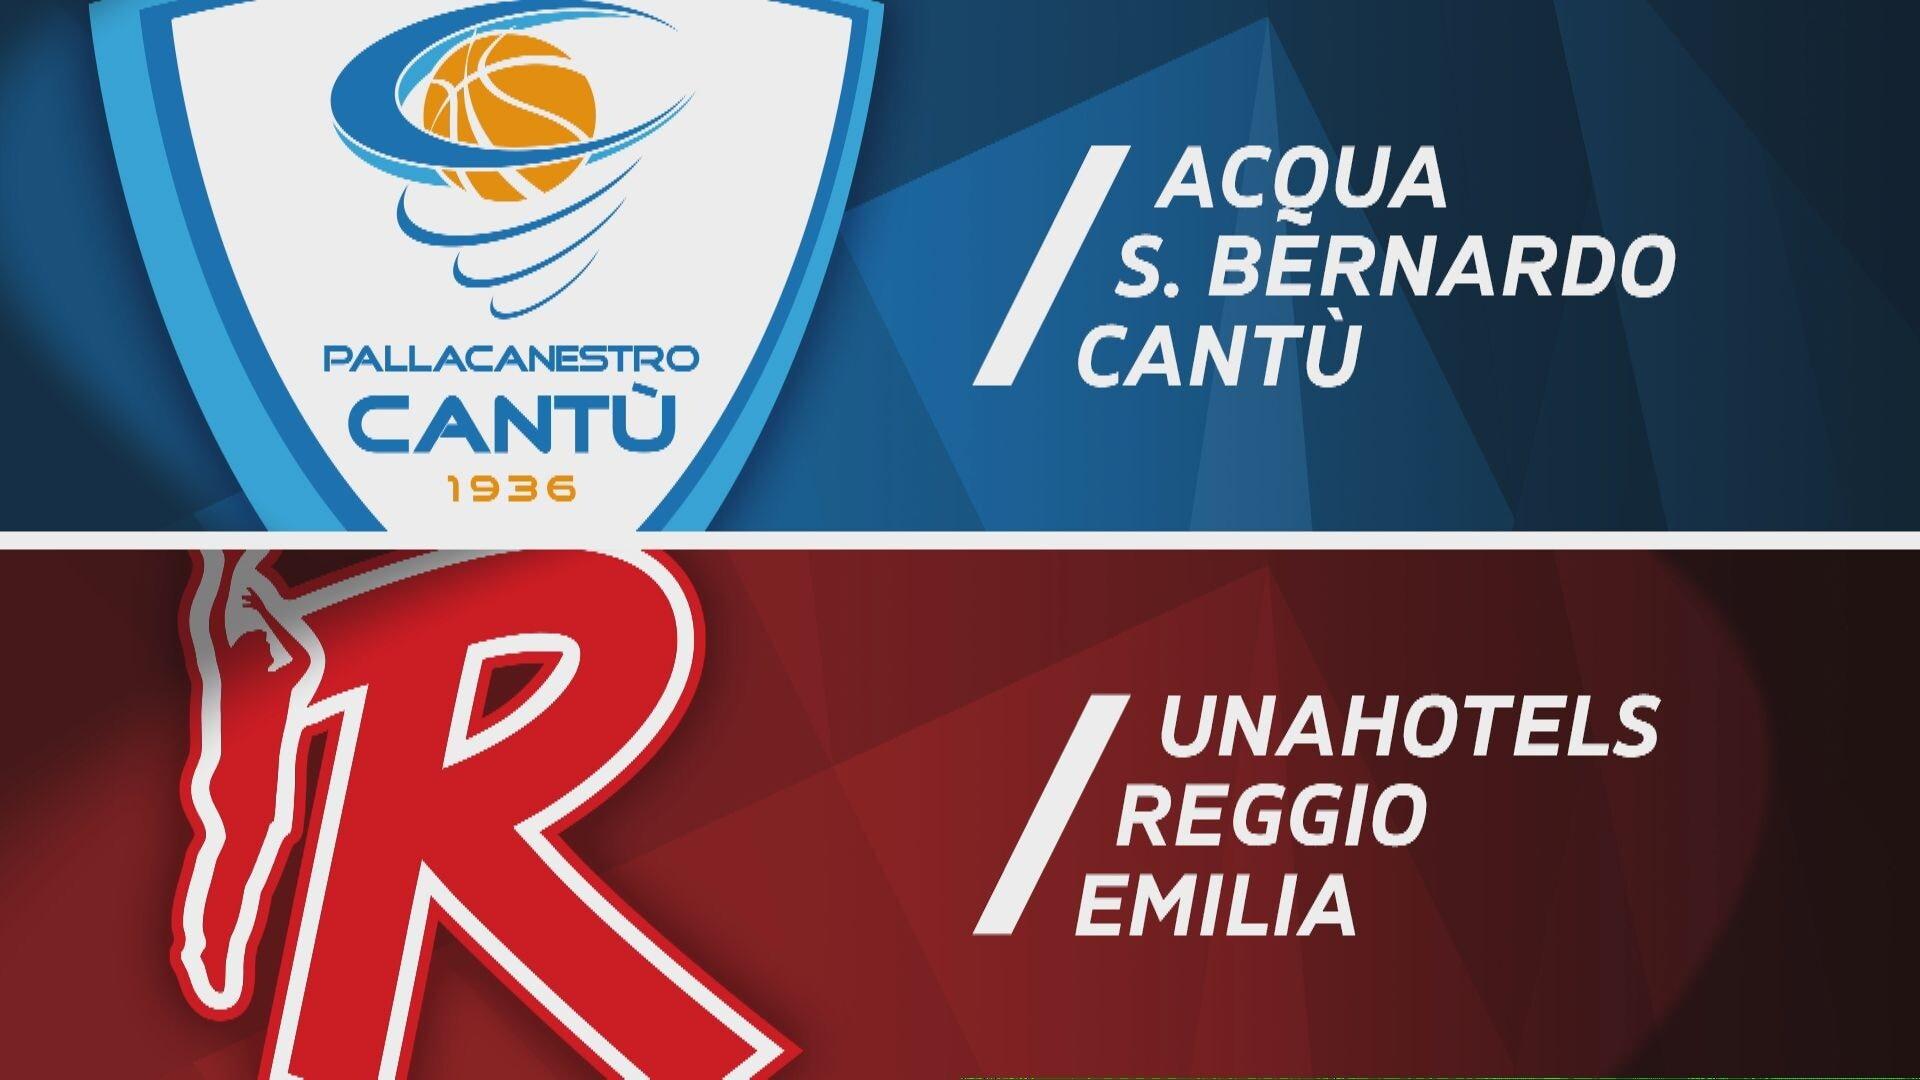 Acqua S.Bernardo Cantù - UNAHOTELS Reggio Emilia 71-72